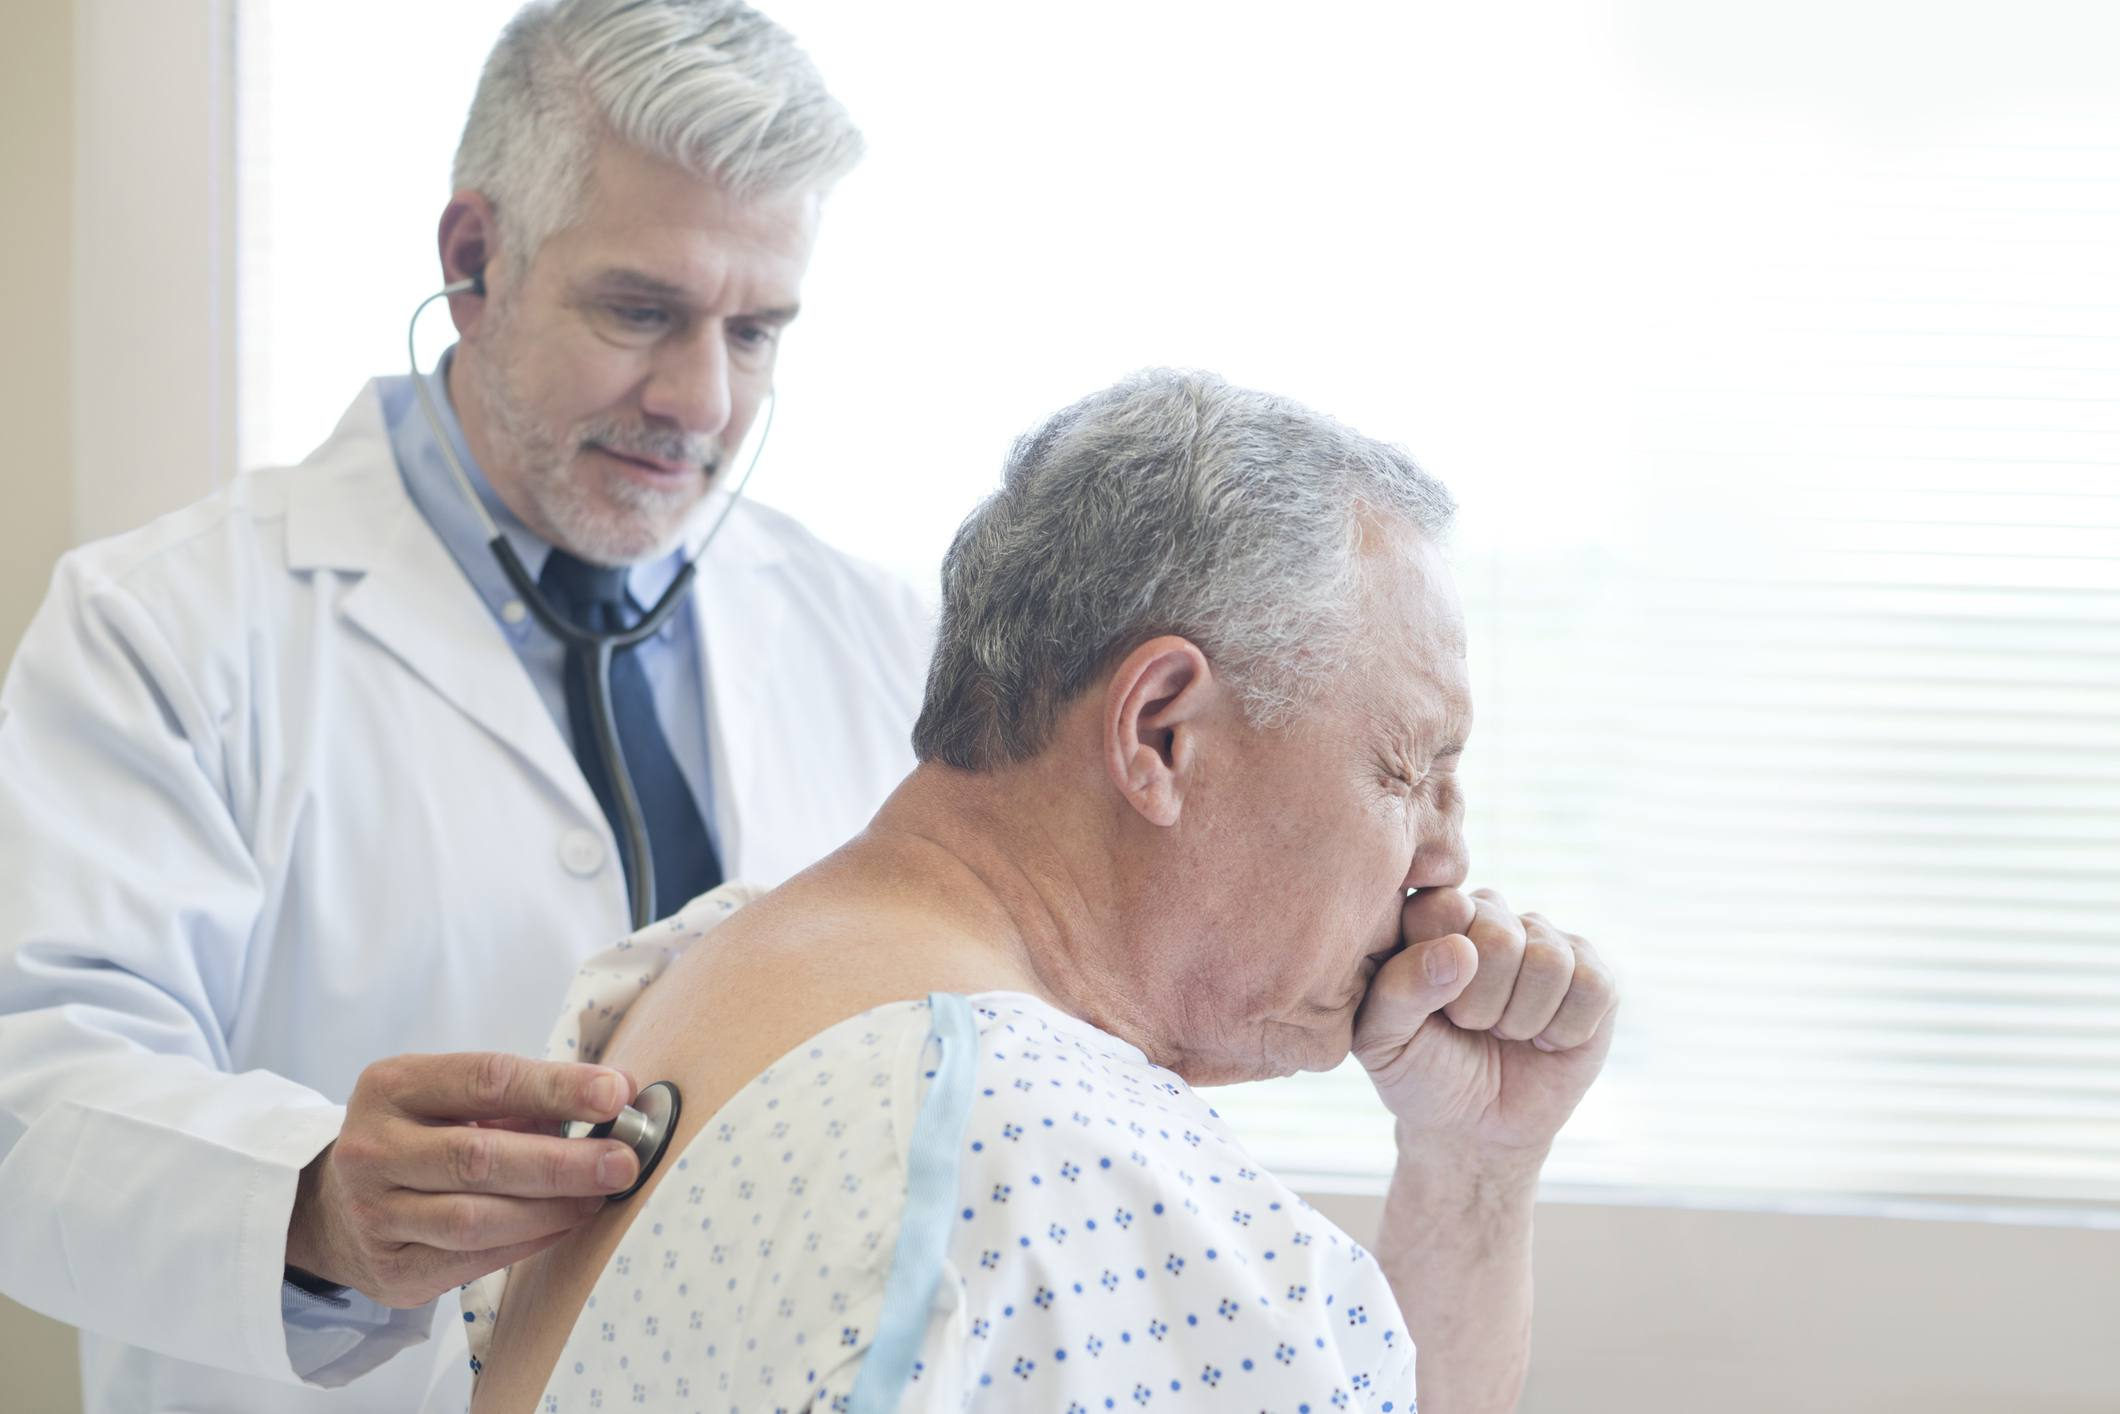 Hpv virus symptoms male. Human papillomavirus vaccine in german